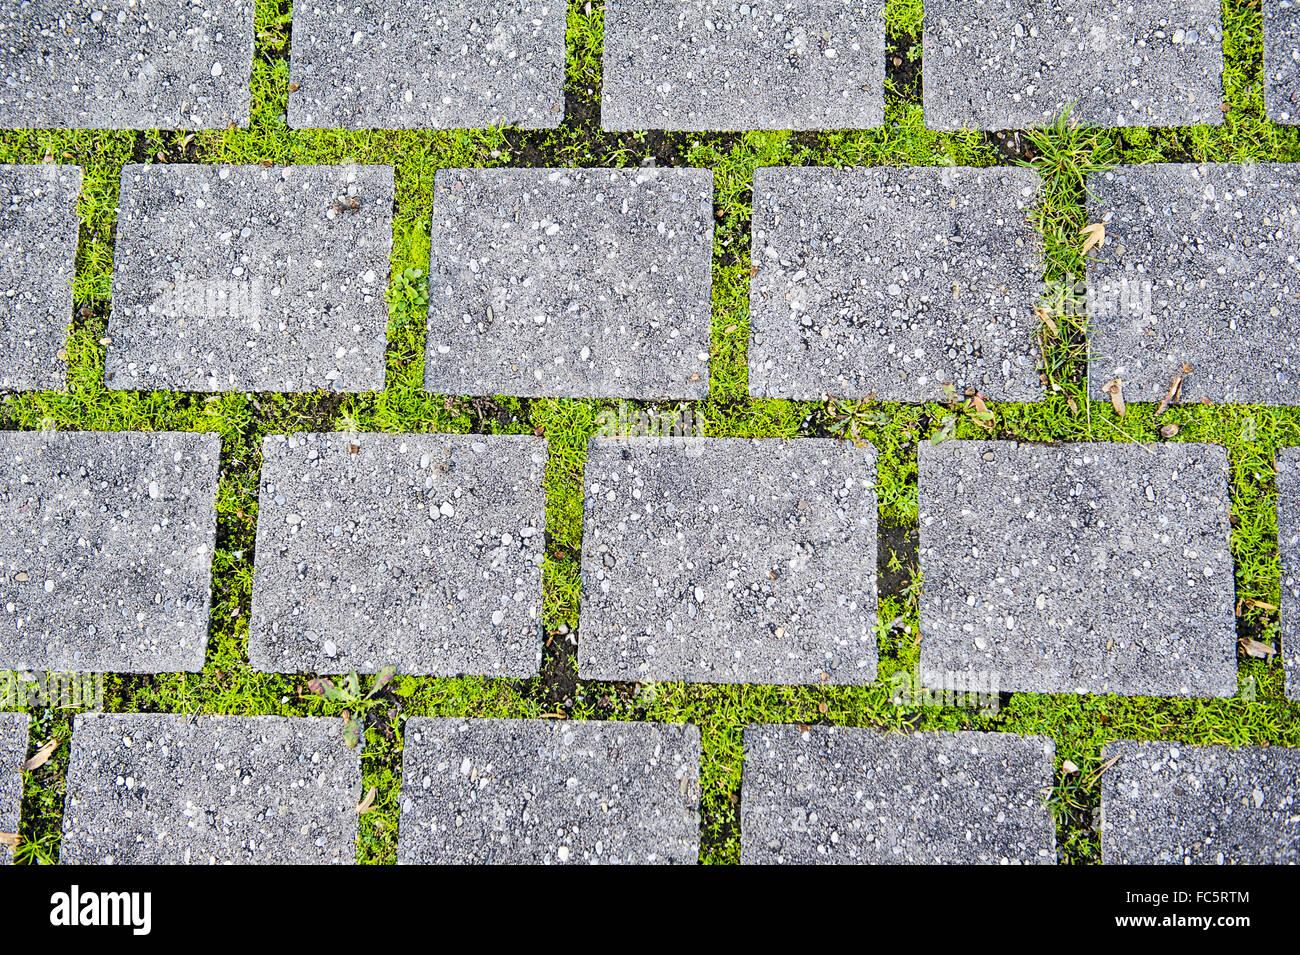 Steinmuster Stock Photos & Steinmuster Stock Images - Alamy